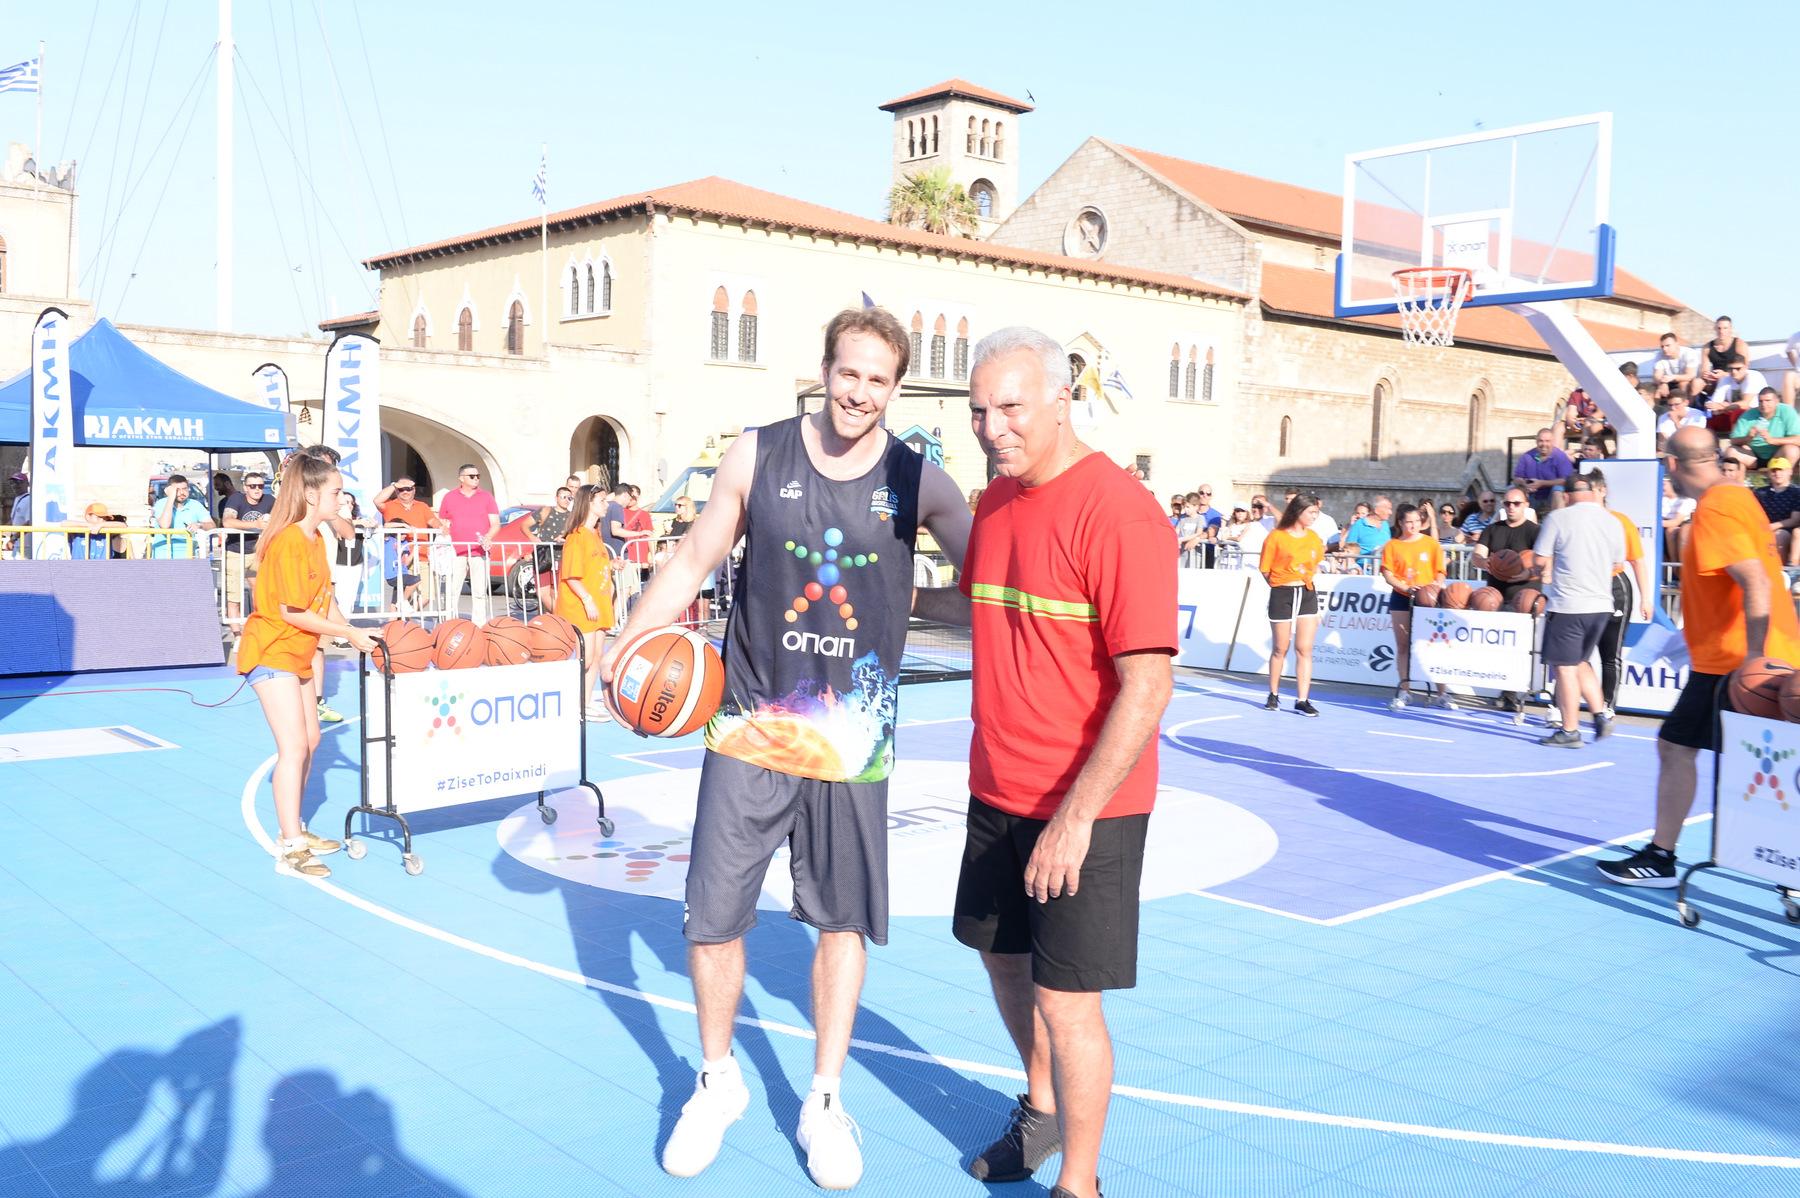 GalisBasketball 3on3: Δείτε τον Δημήτρη Βεργίνη να θριαμβεύει στο ΟΠΑΠ Skills Challenge! (video)